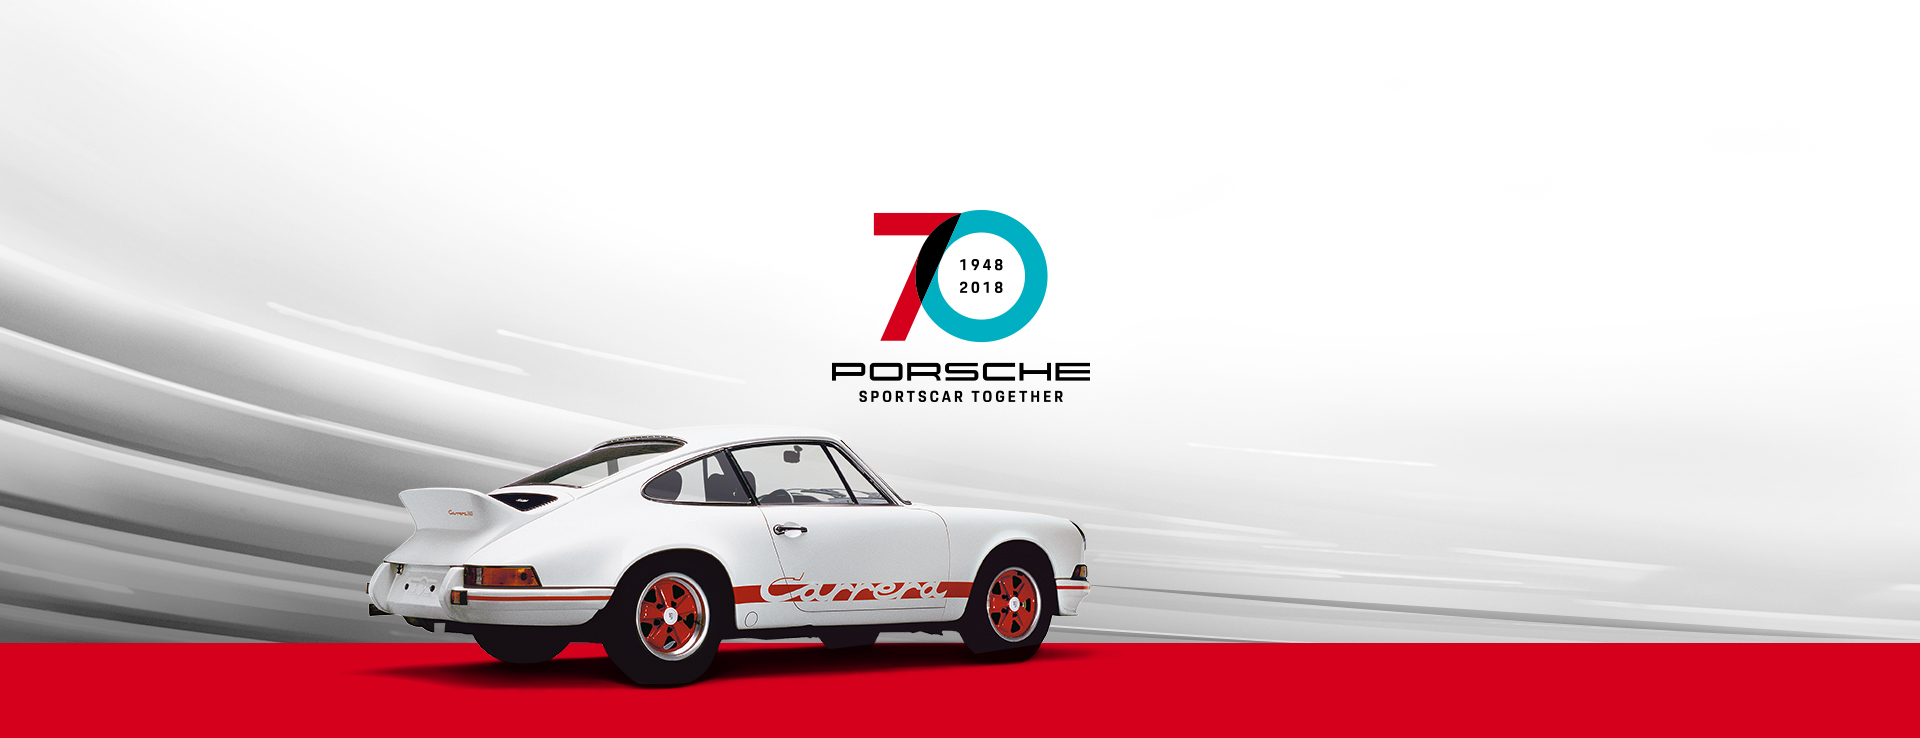 70-Years-of-Porsche.jpg